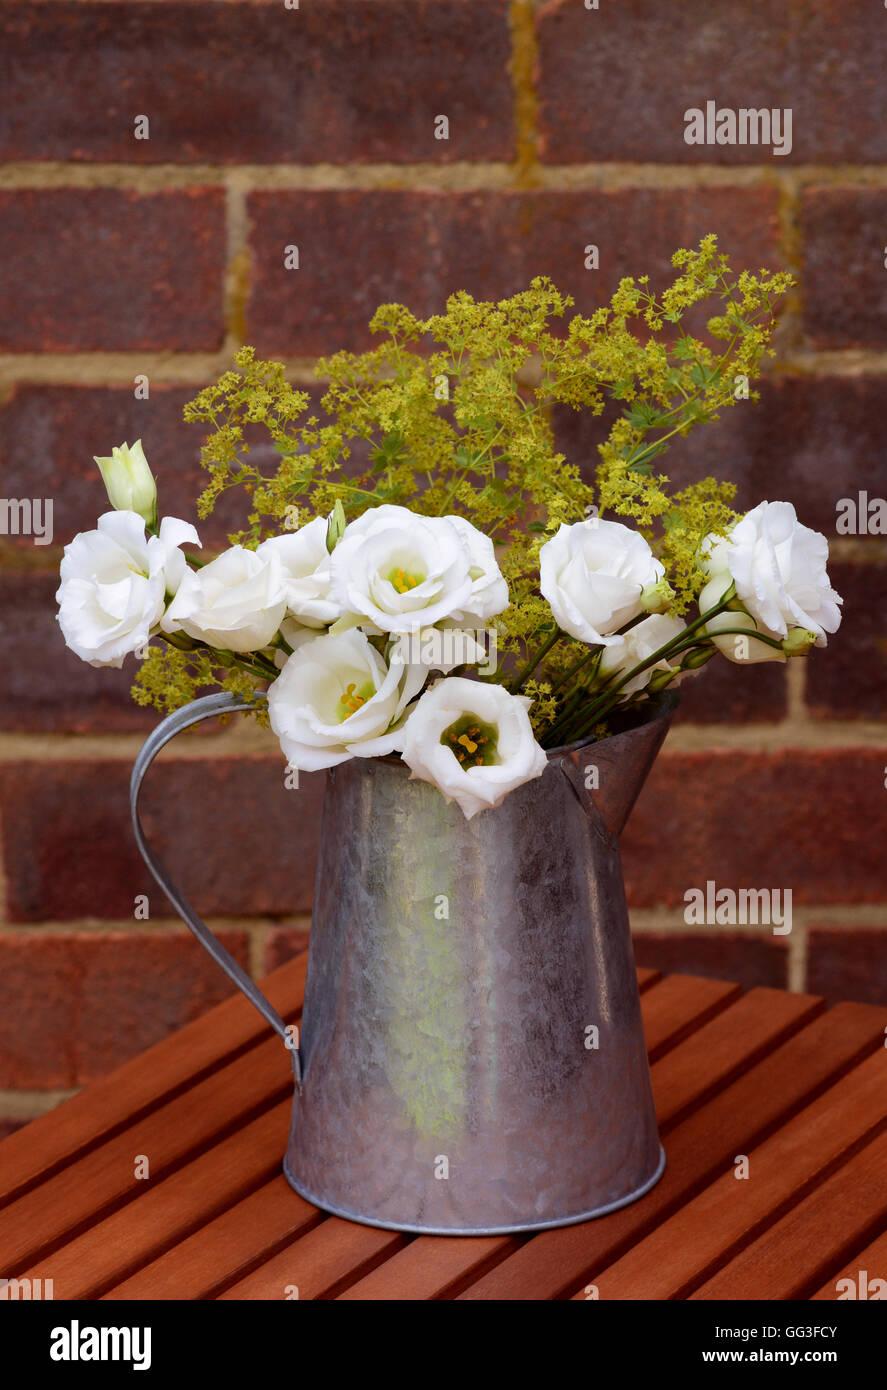 Floral arrangement of white prairie gentians and delicate alchemilla mollis in a vintage metal jug - Stock Image